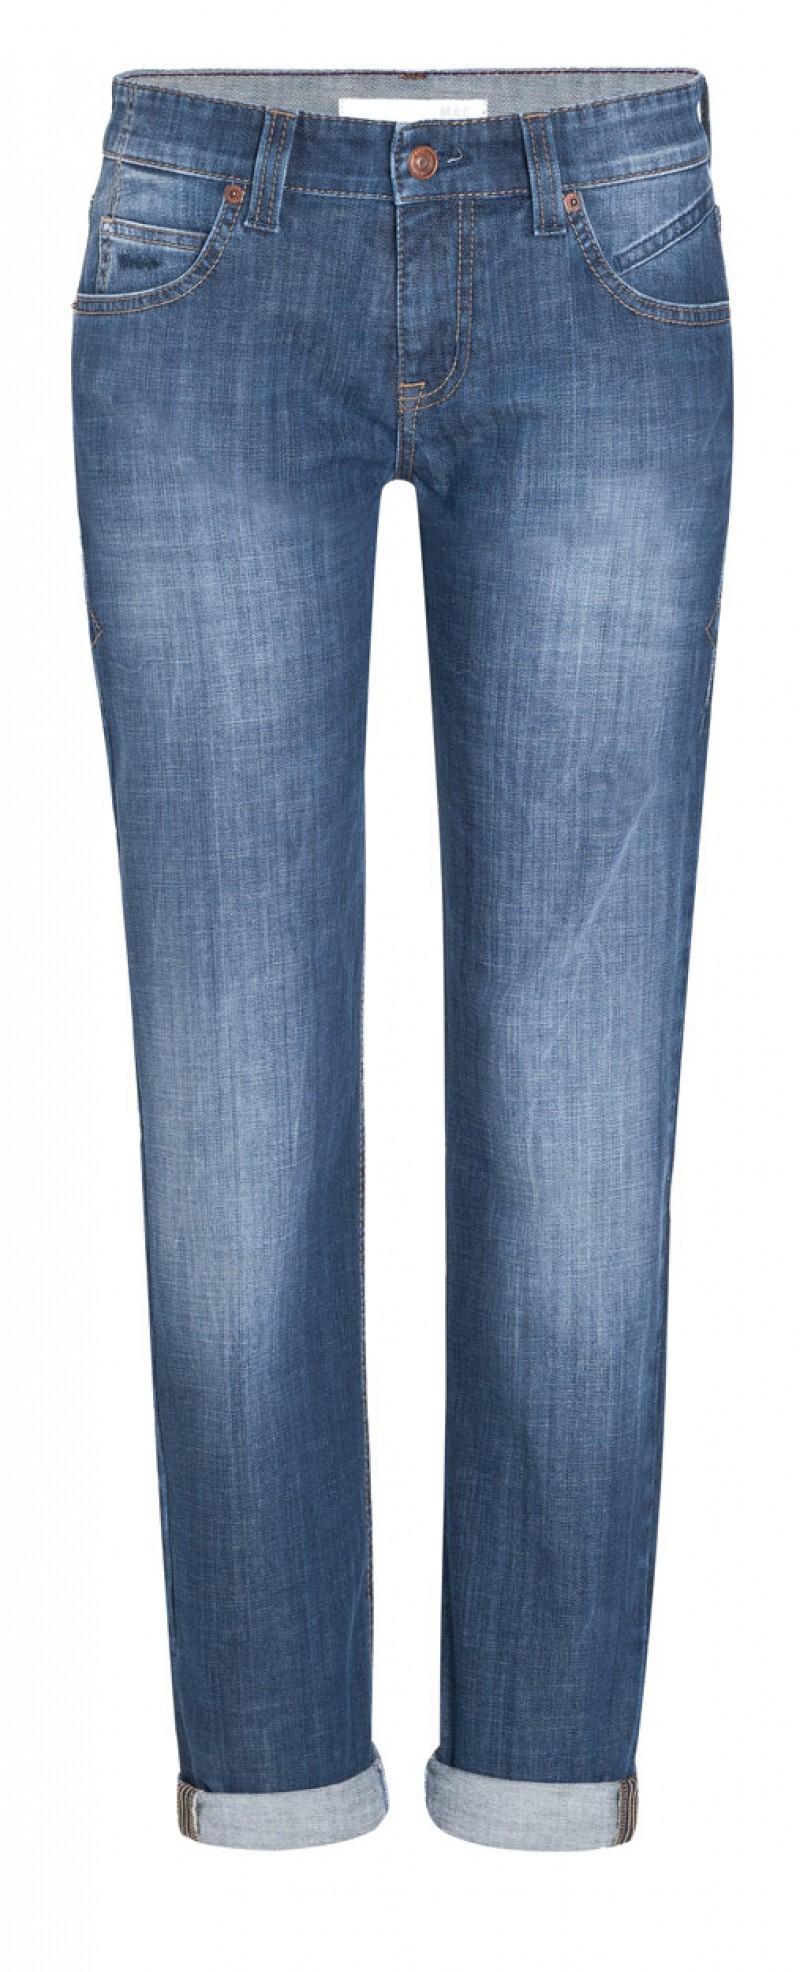 Mac Boyfriend Jeans - Casual Fit -  Mid Blue Wash